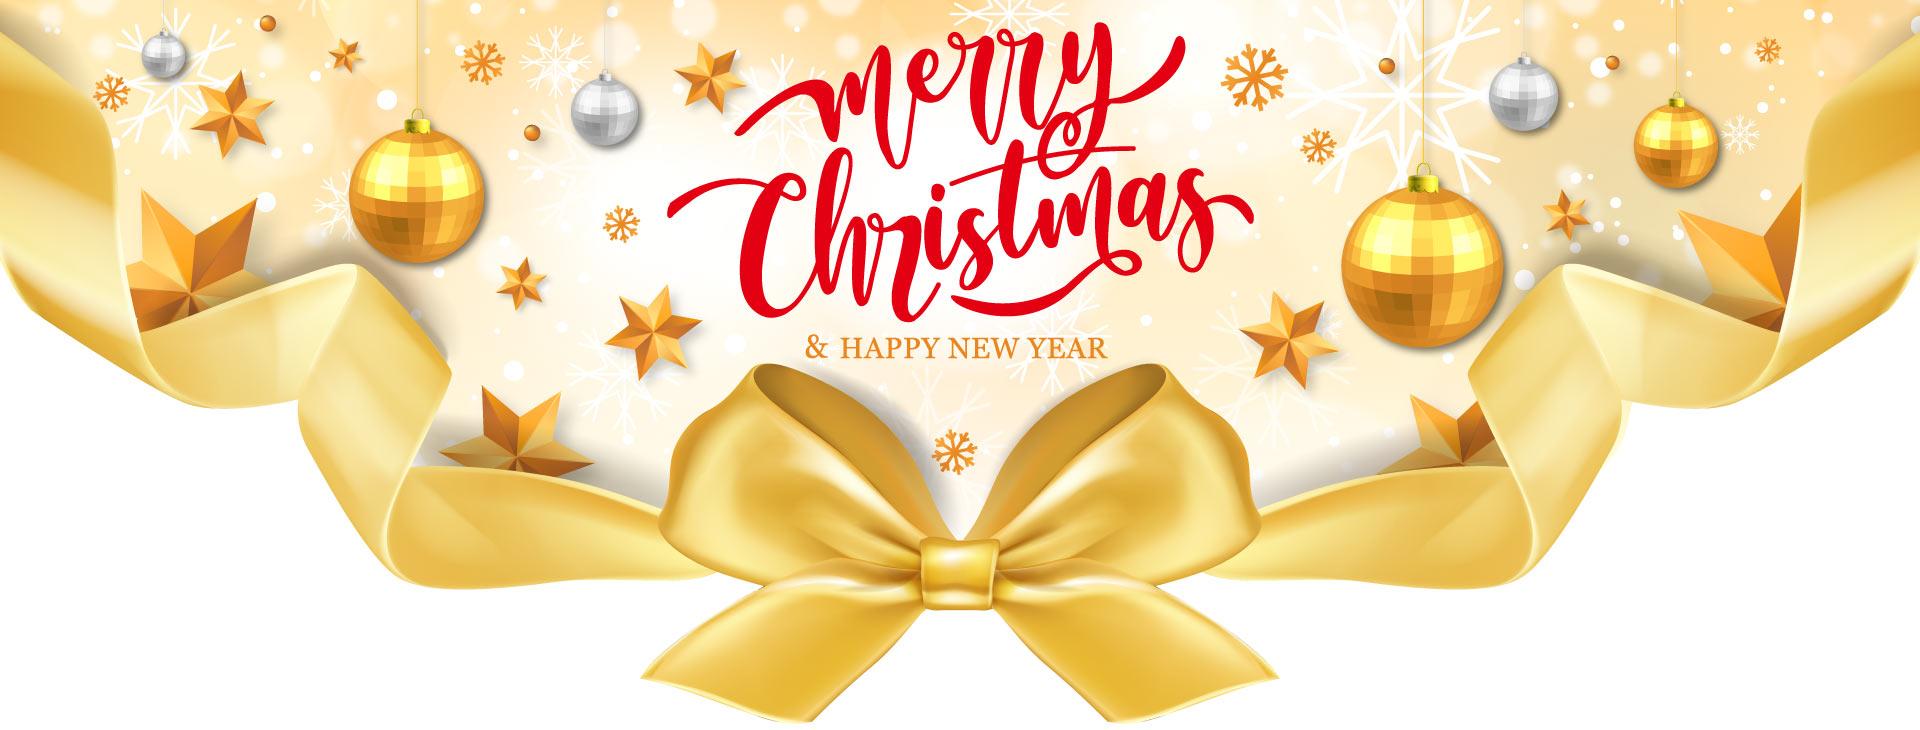 Merry Christmas&Happy New Year